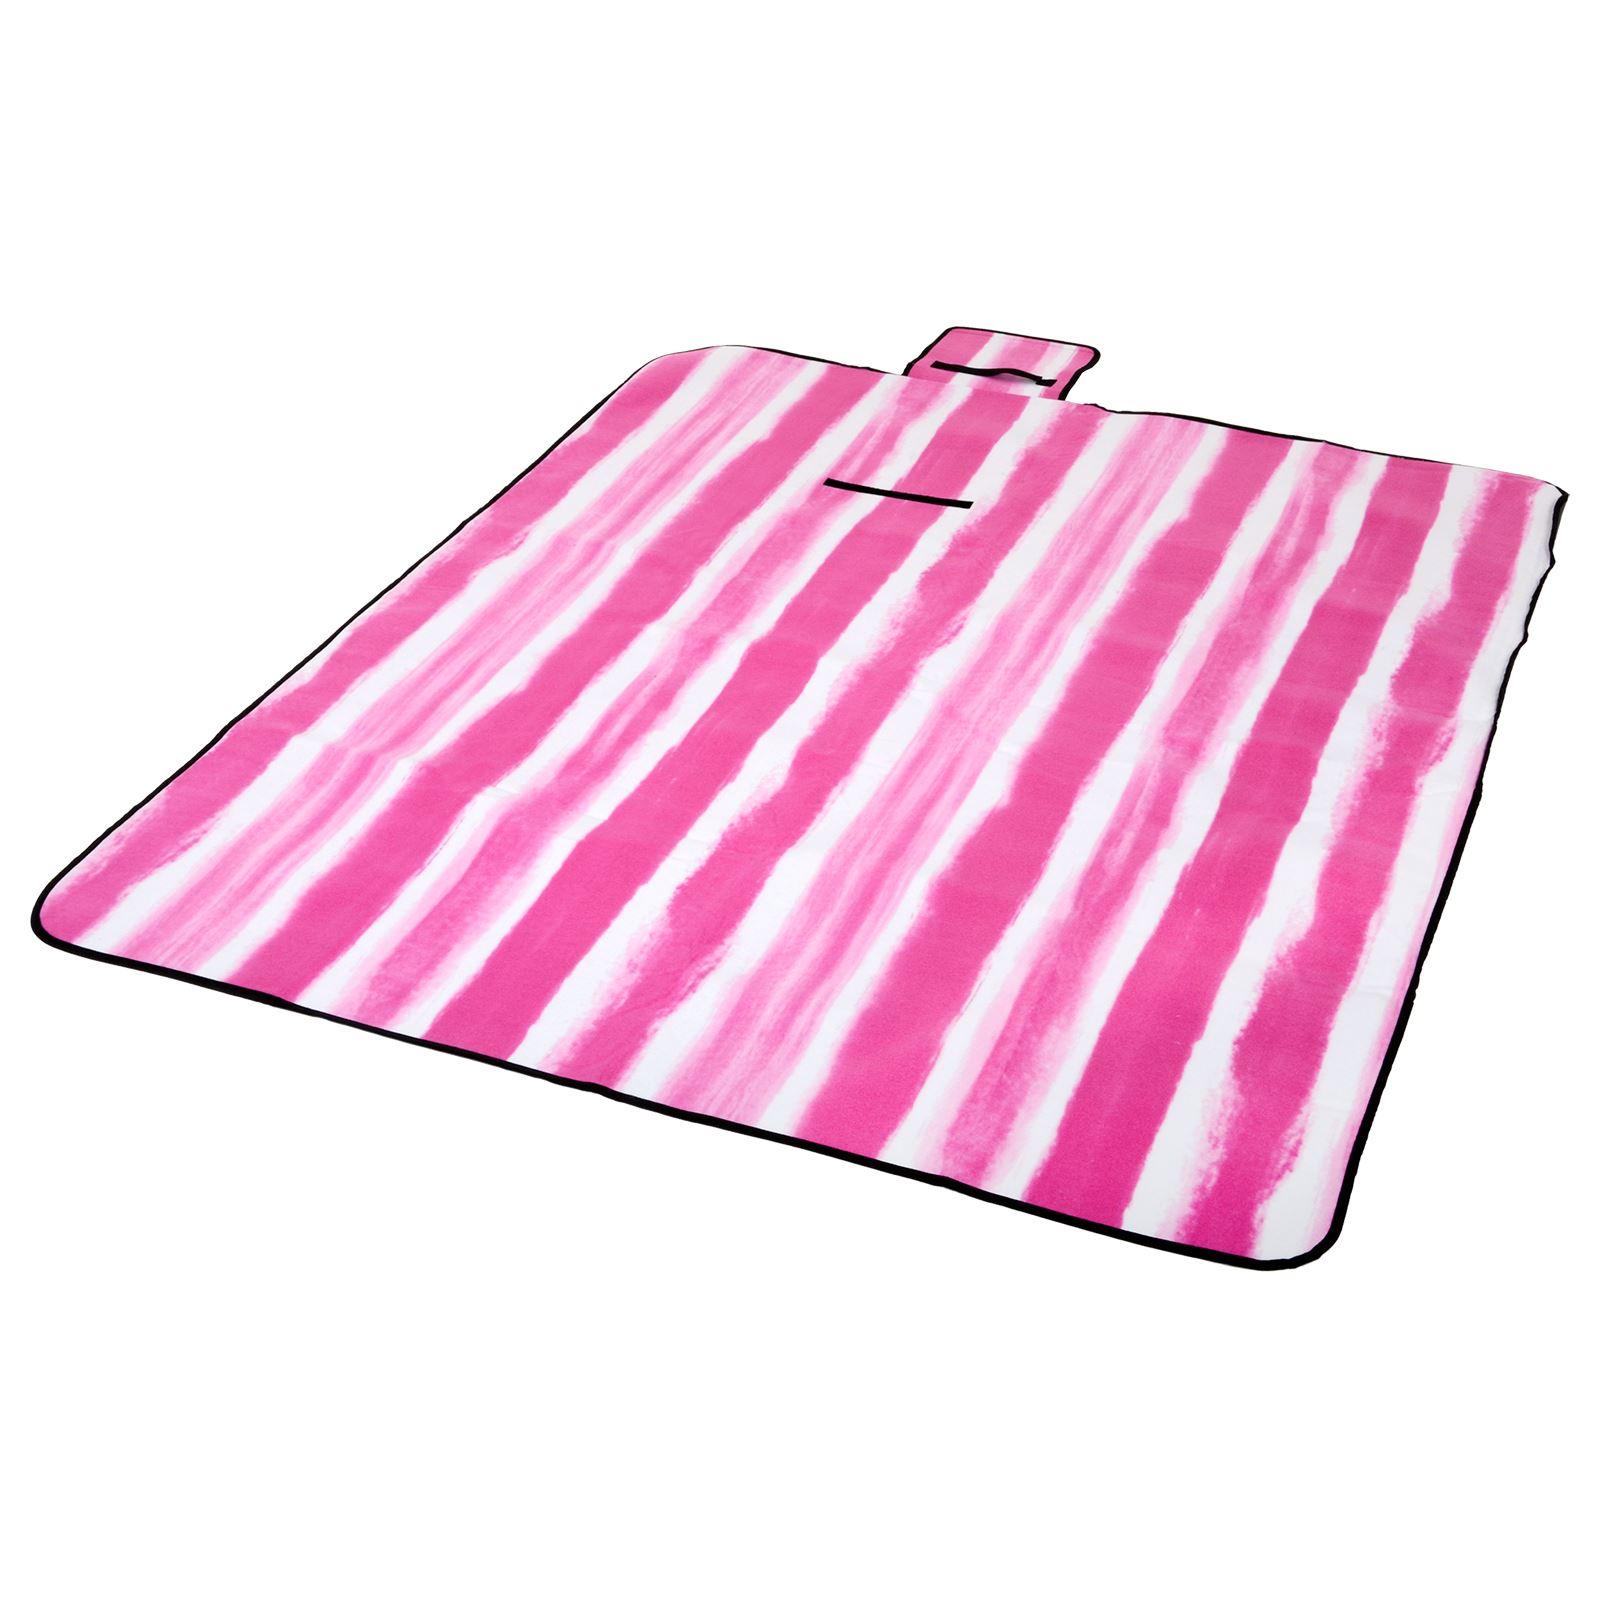 Picnic Blanket: Azuma Outdoor Picnic Blanket Rug PEVA Waterproof Backing